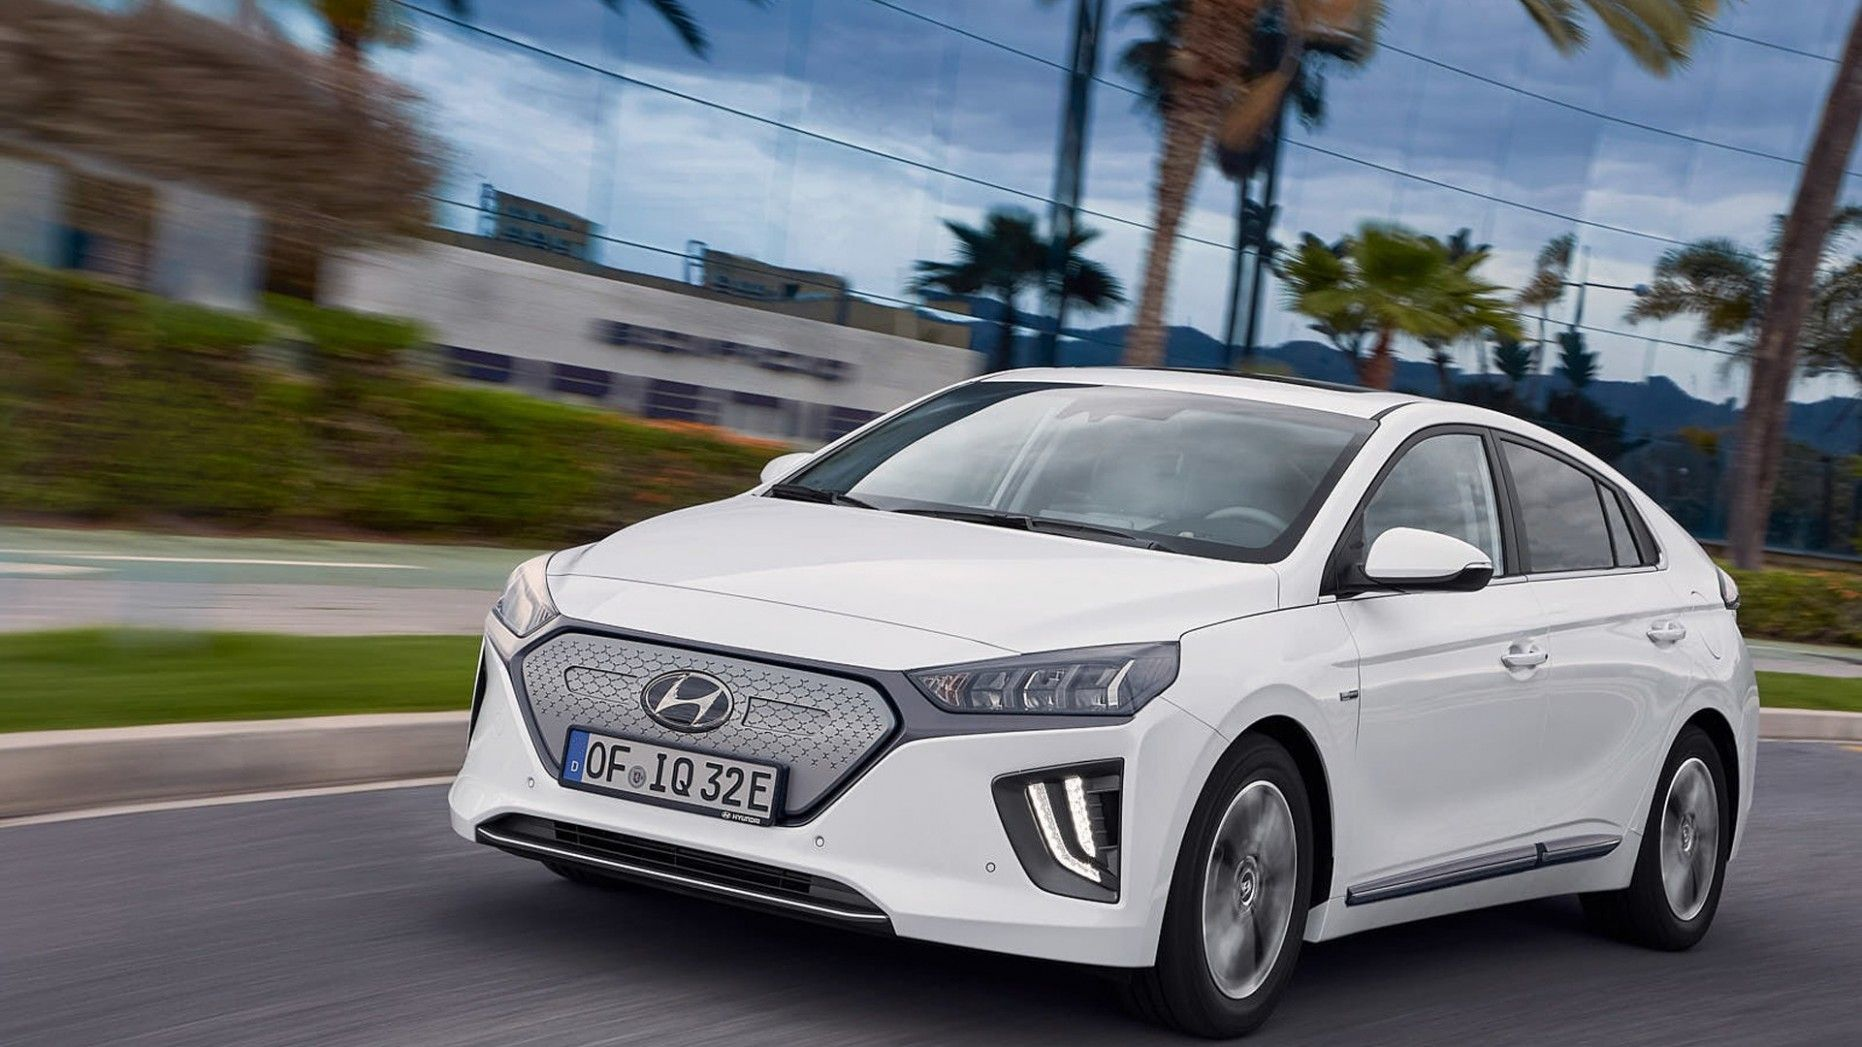 Hyundai Models 2020 Research New Mobil Bmw Toyota